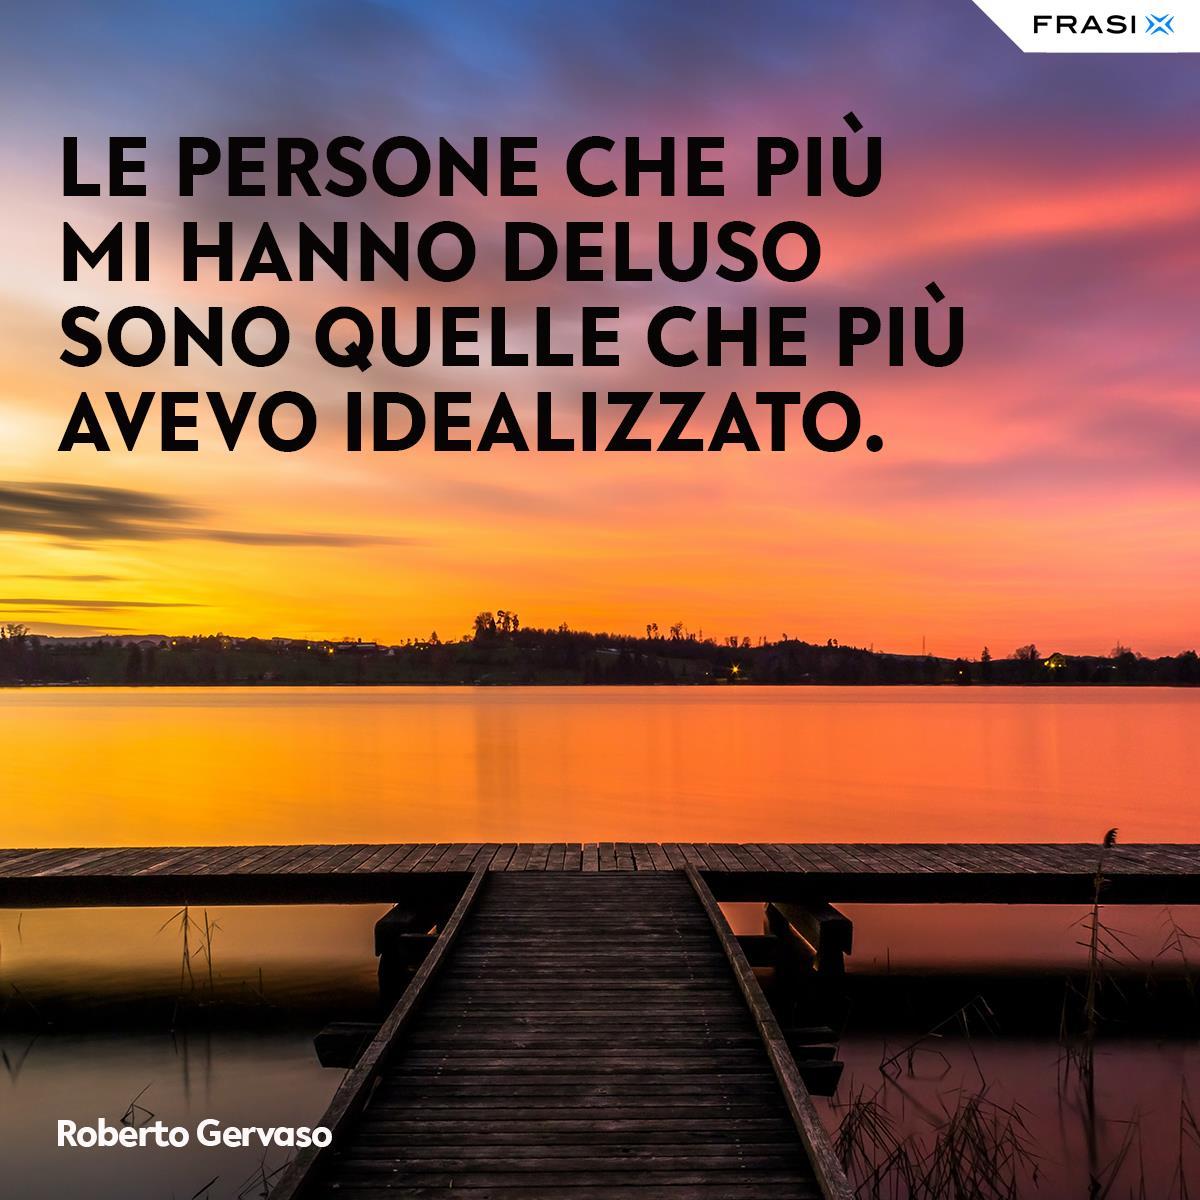 Frasi depresse amicizia Roberto Gervaso